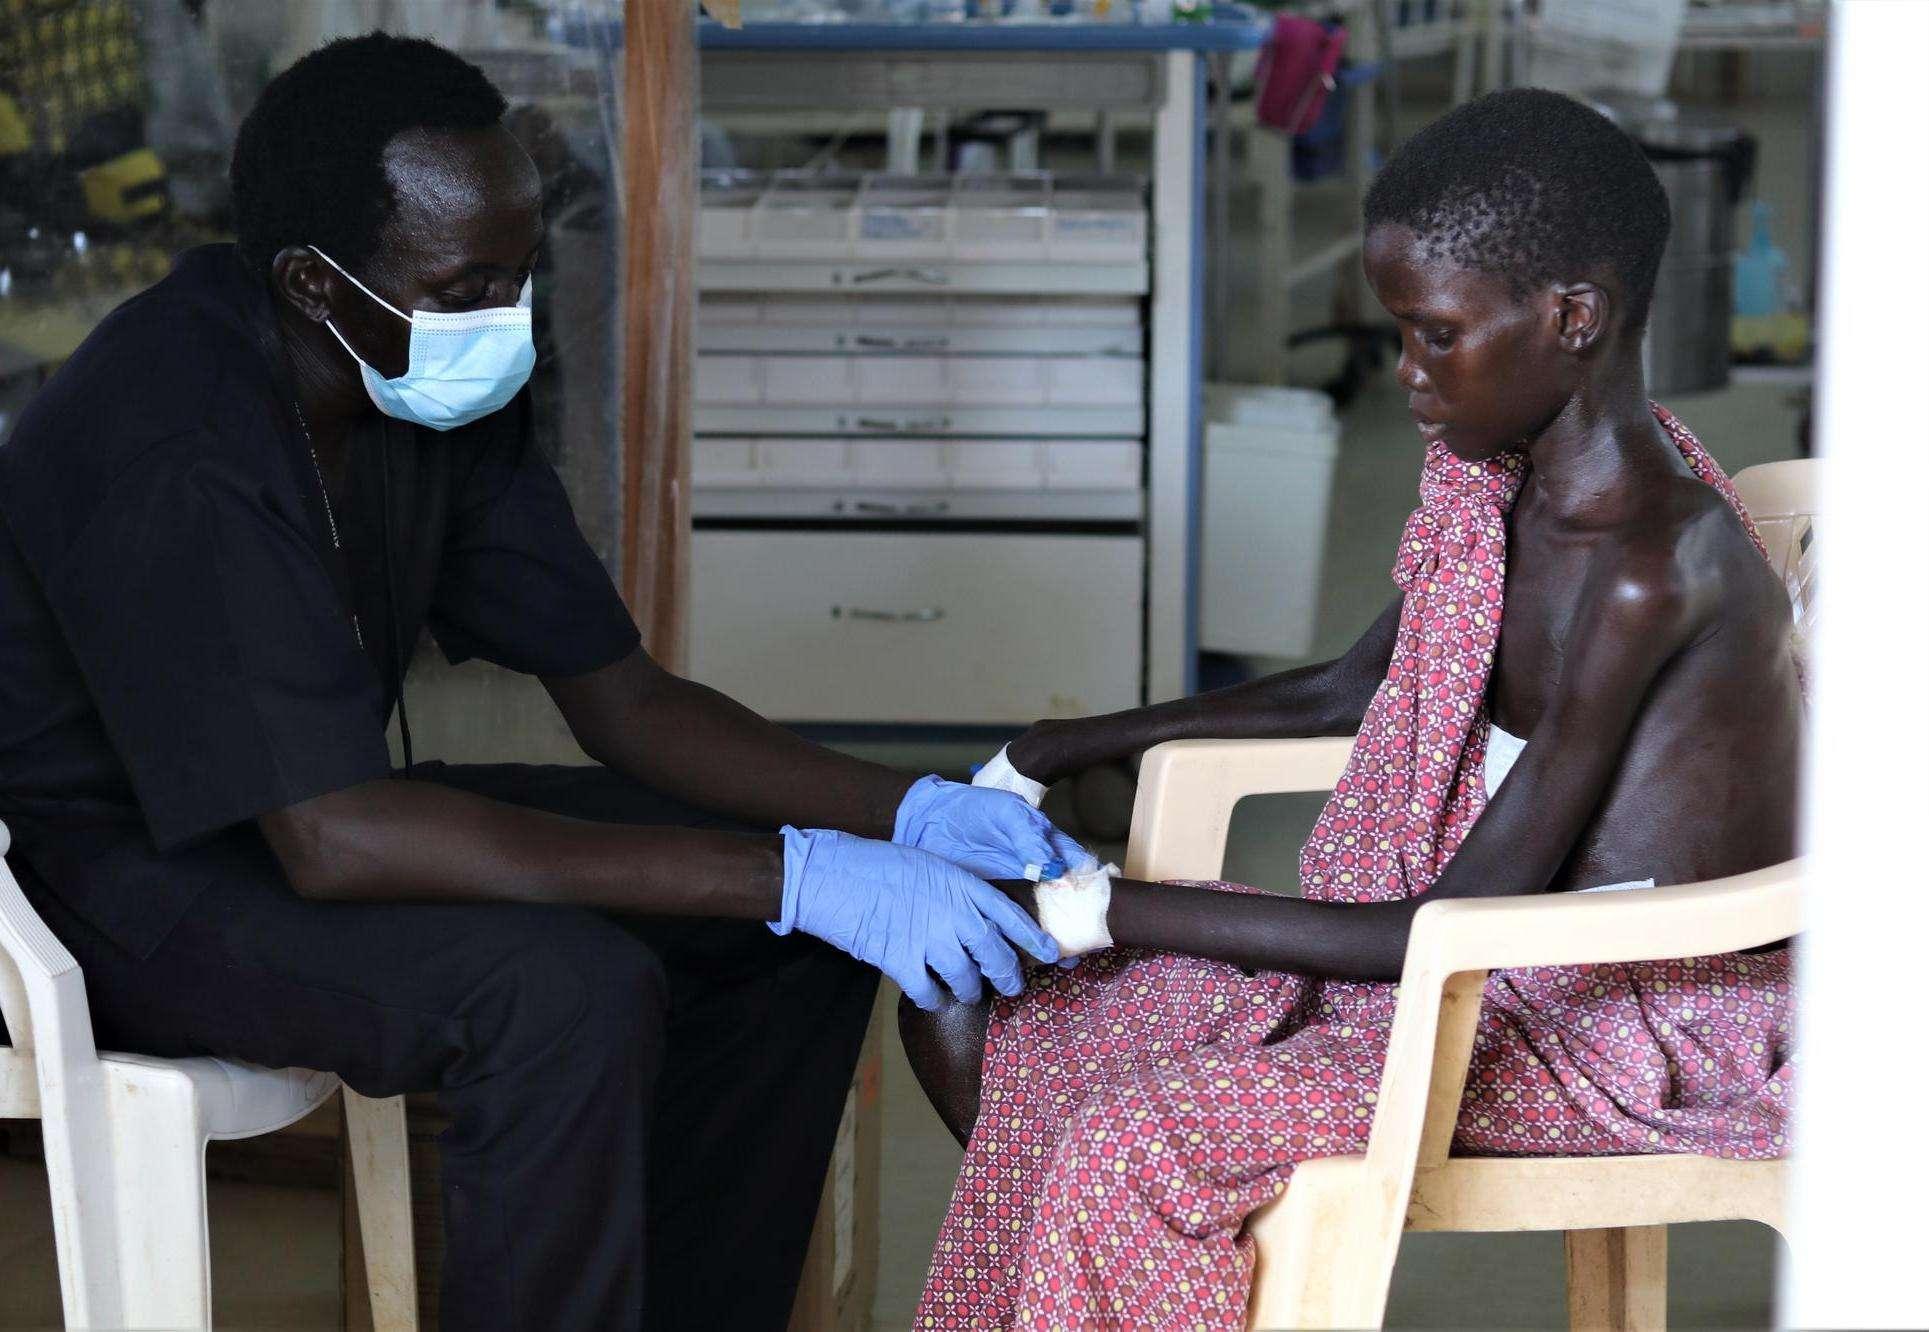 South Sudan floods: Yoel, 13-years-old, Bentiu PoC